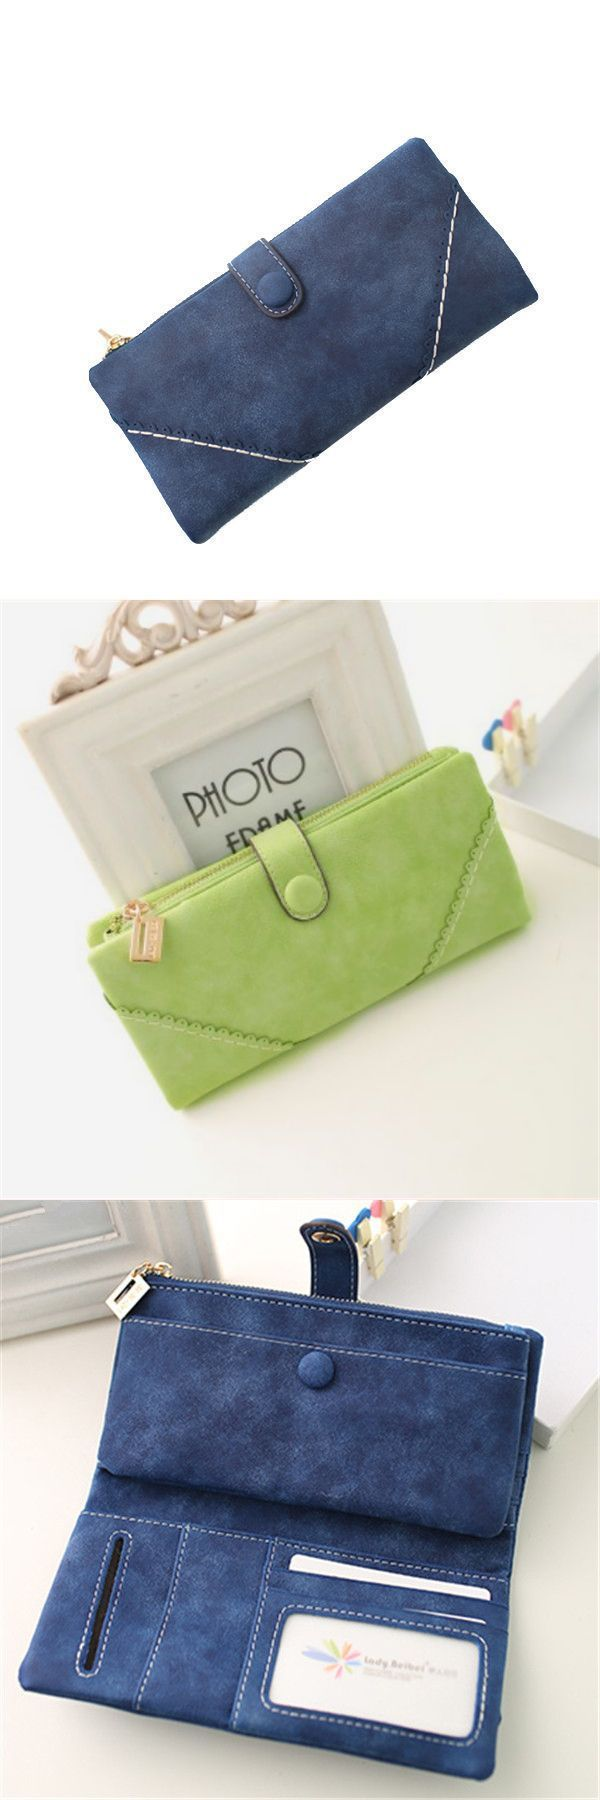 Wallets and wristlets women synthetic pu leather clutch bag zipper button purse #8 #free #wallets #prestige #portraits #triple #d #wallets #wallets #quiksilver #wallets #trifold